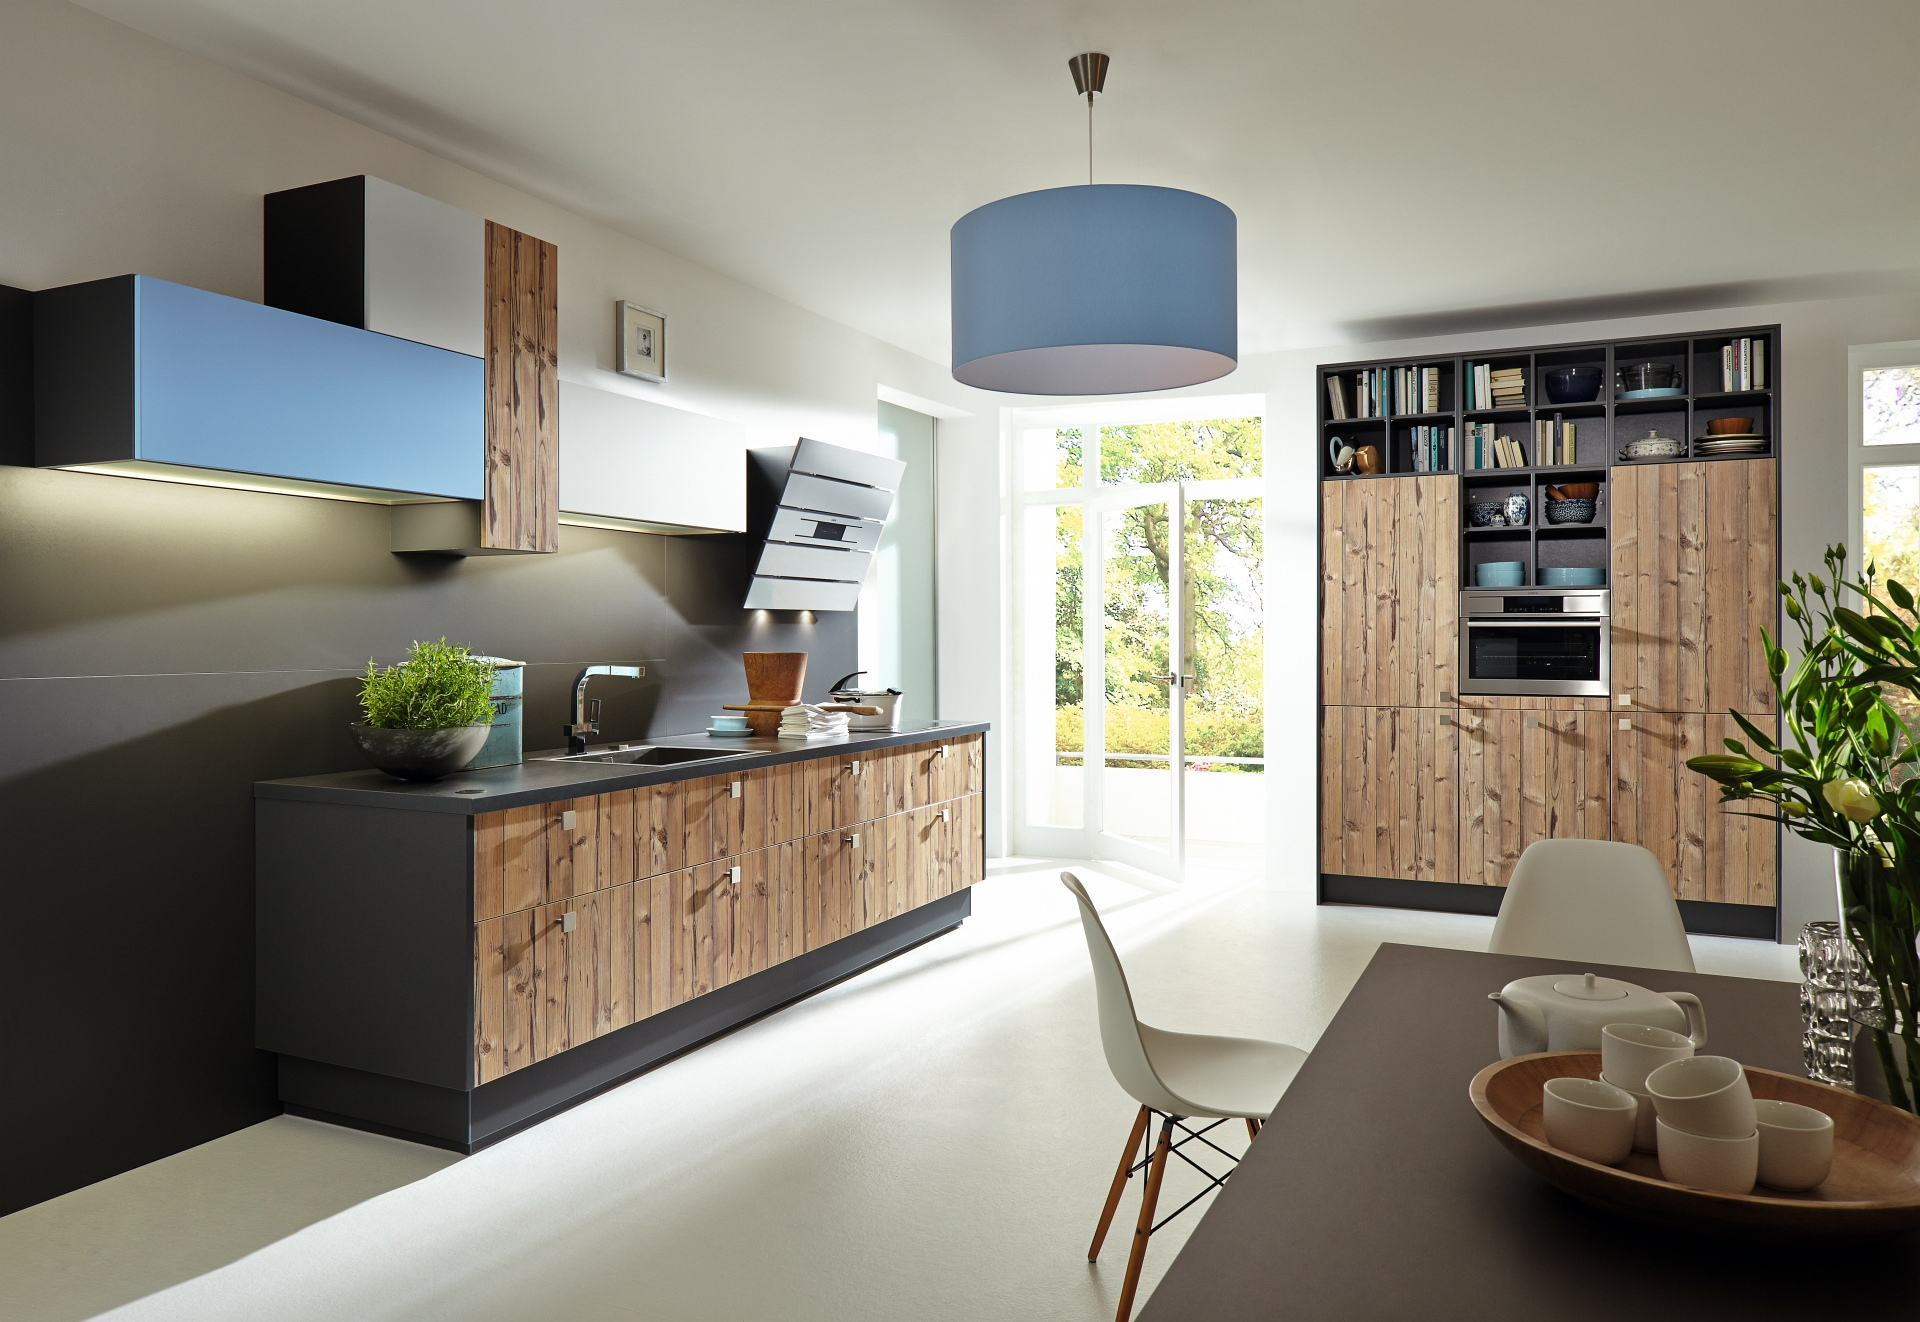 sachsenk chen m llers k che. Black Bedroom Furniture Sets. Home Design Ideas